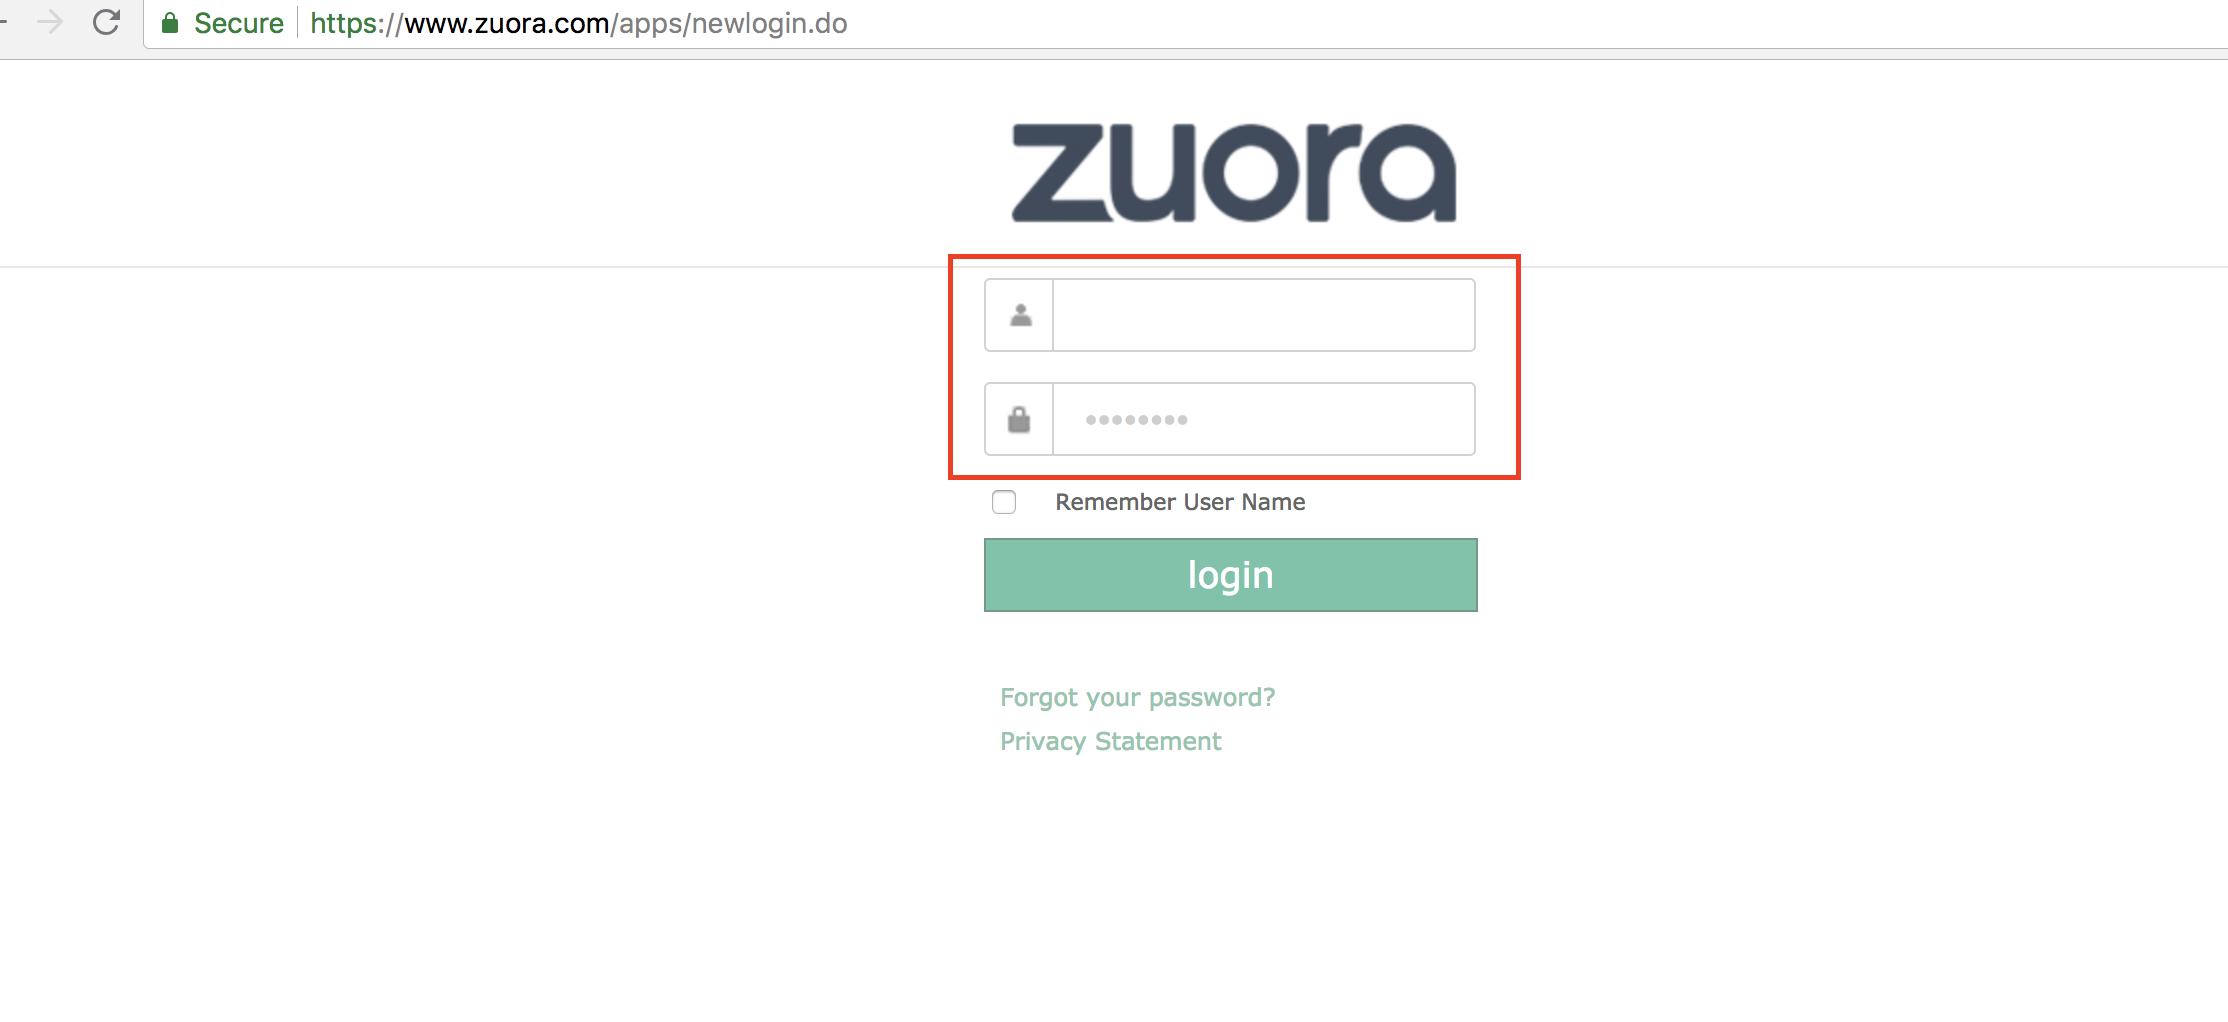 Zuora Screen